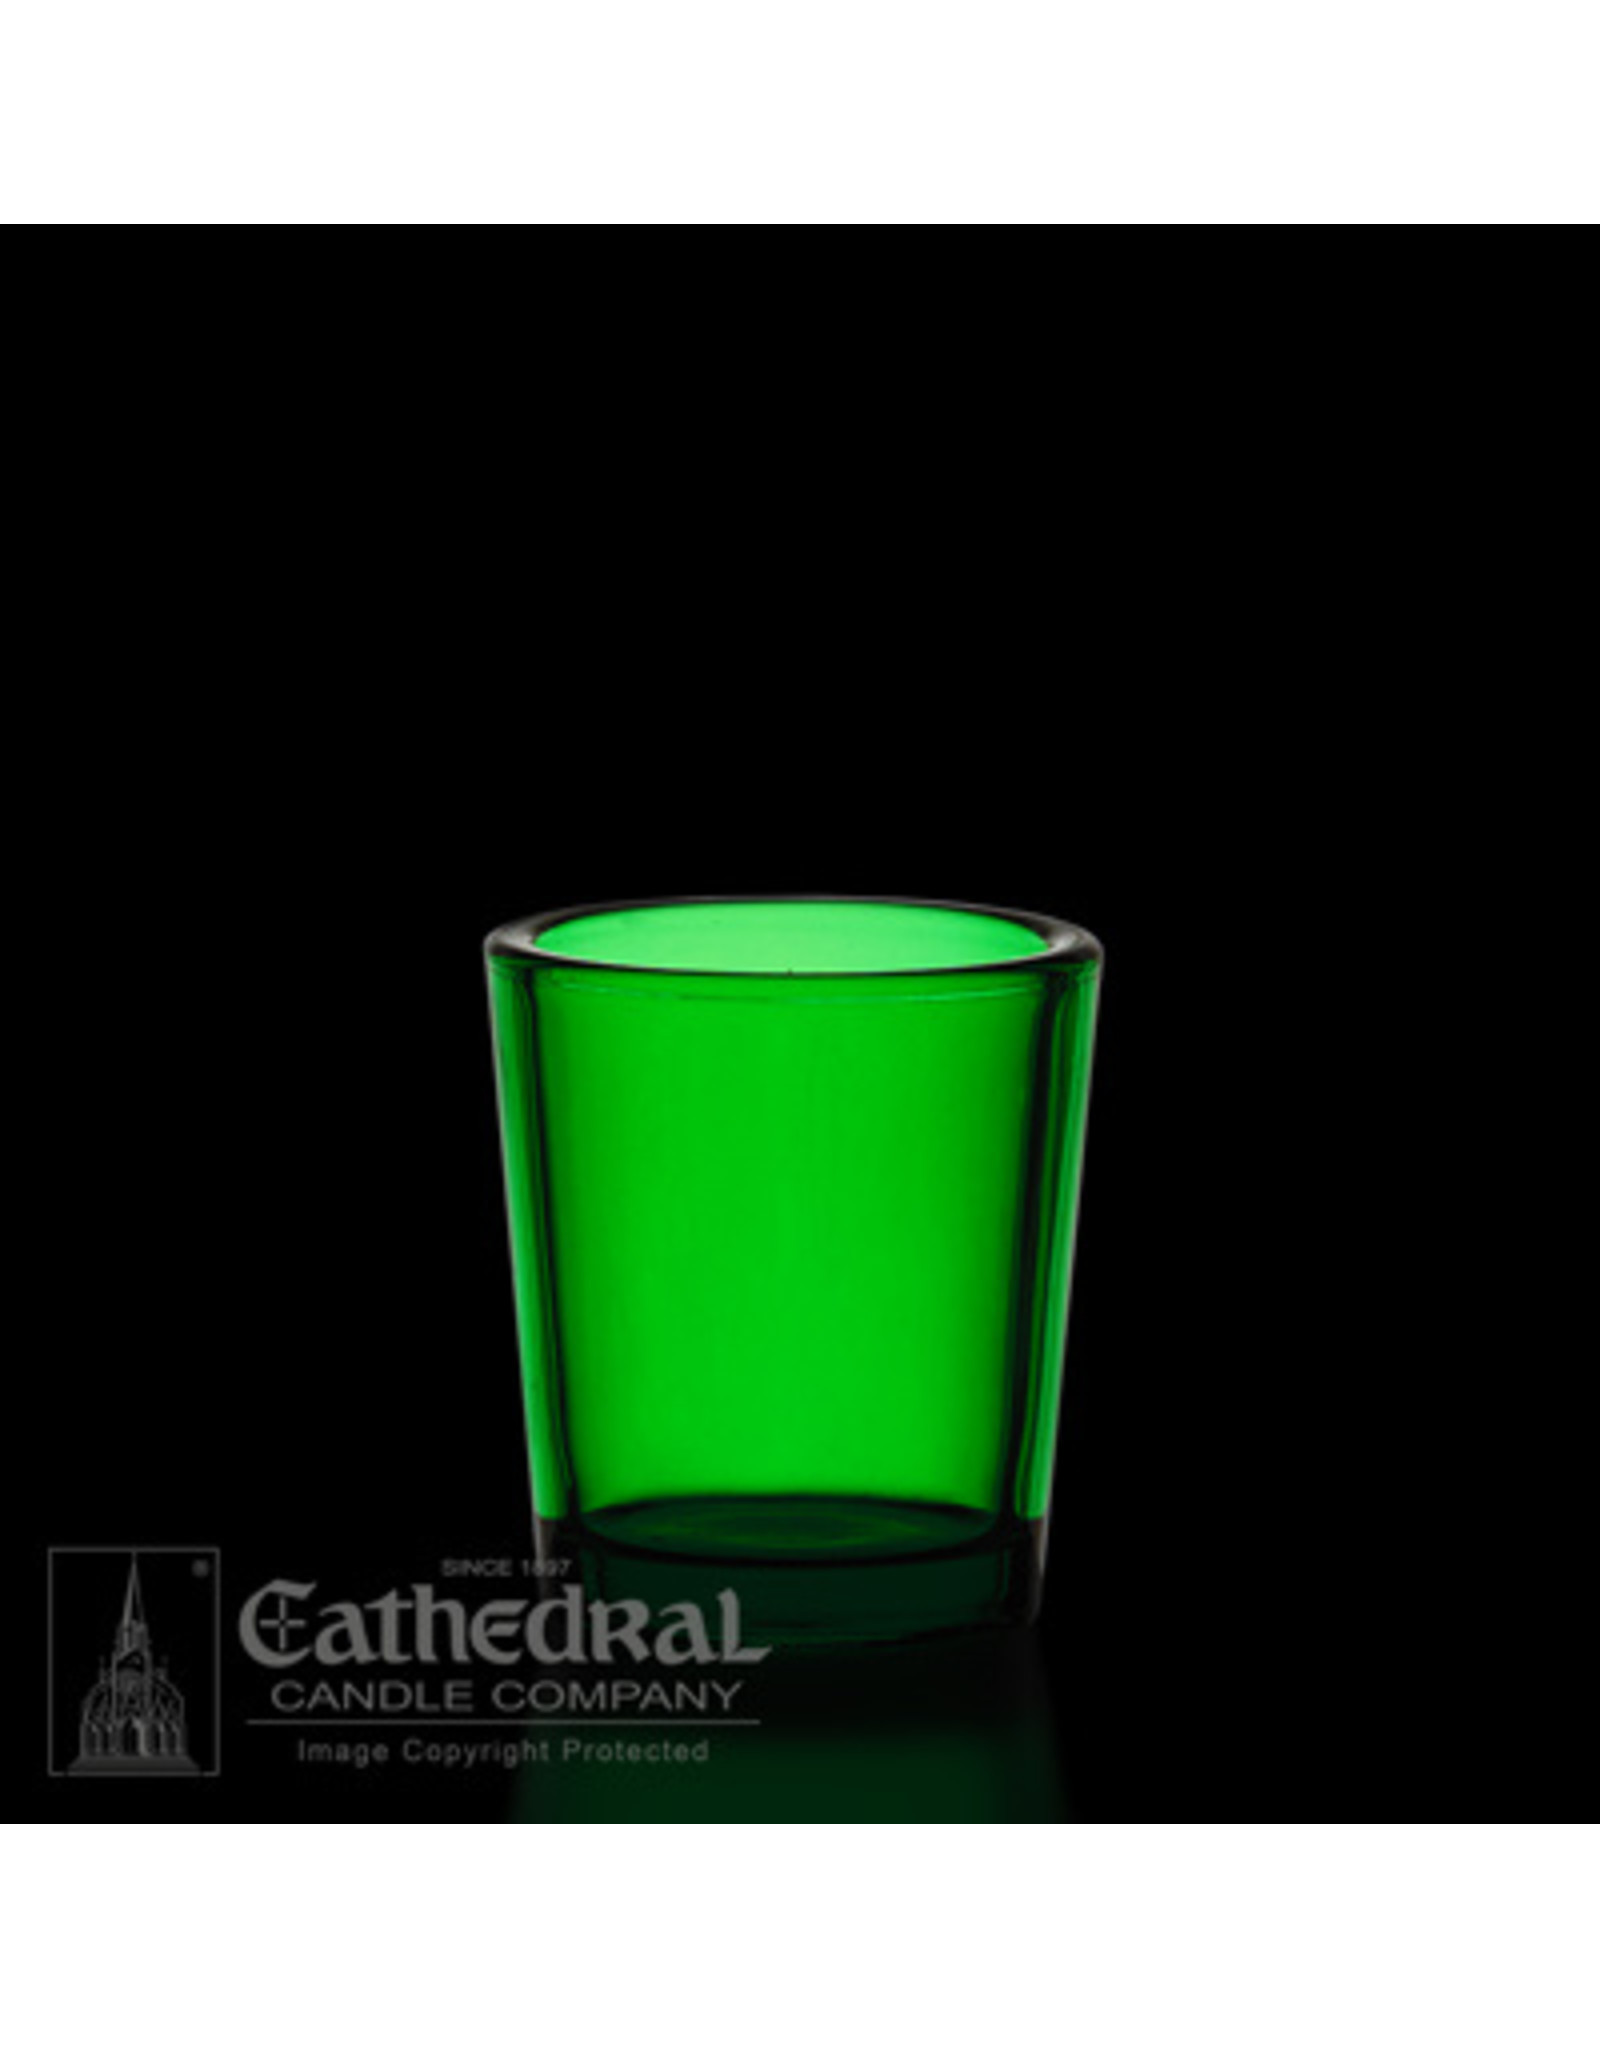 Votive Light Glasses - Green - 15 Hour (12)